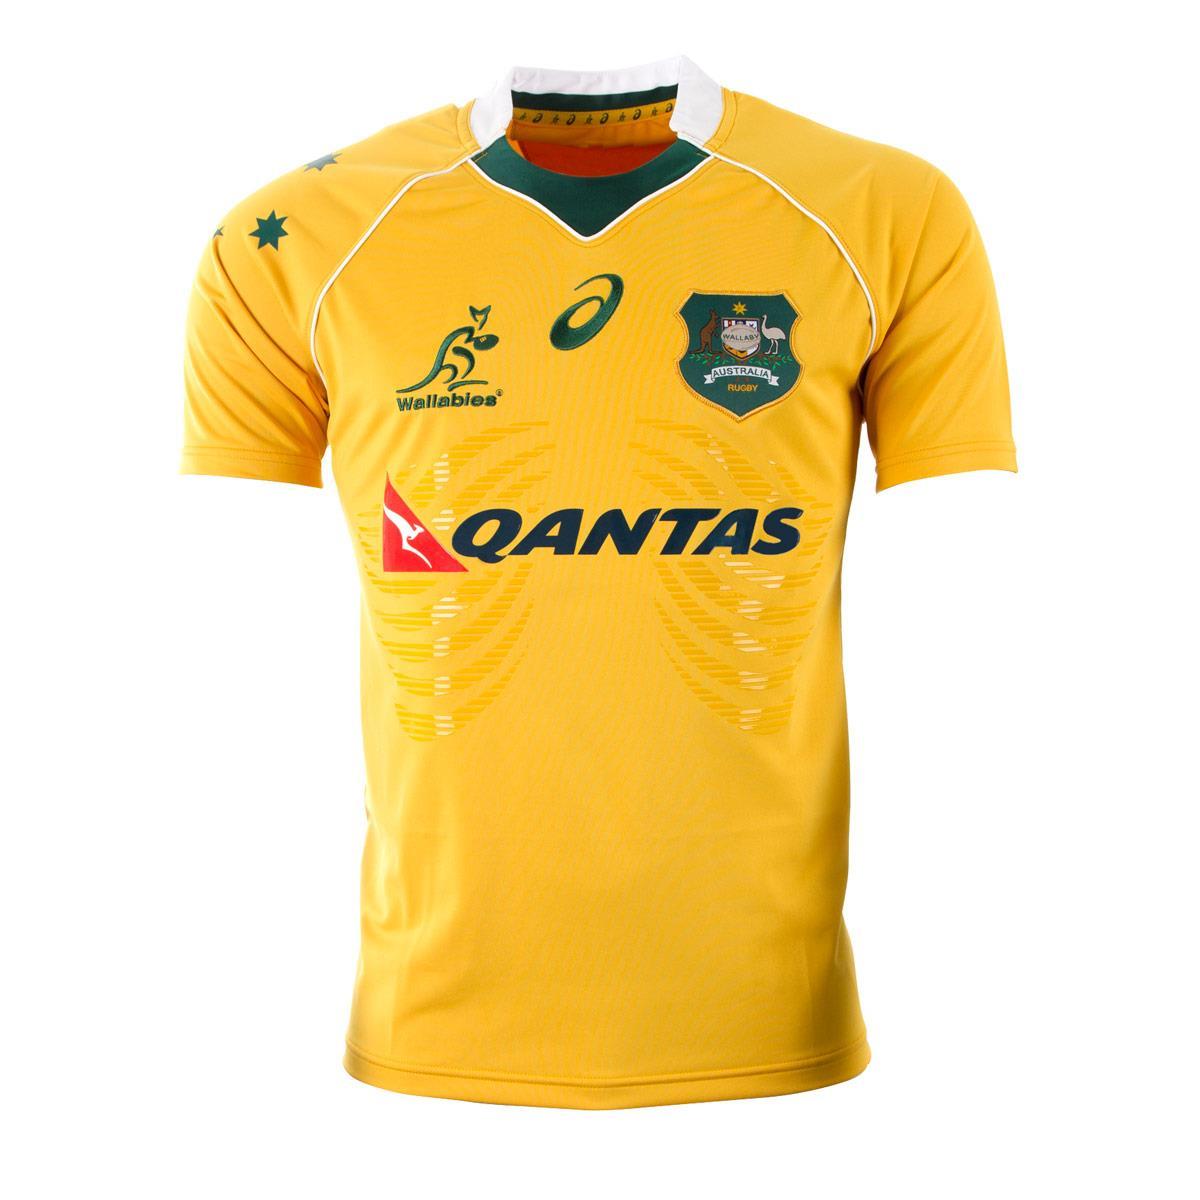 2016-2017 Australia Wallabies Home Test Rugby Shirt